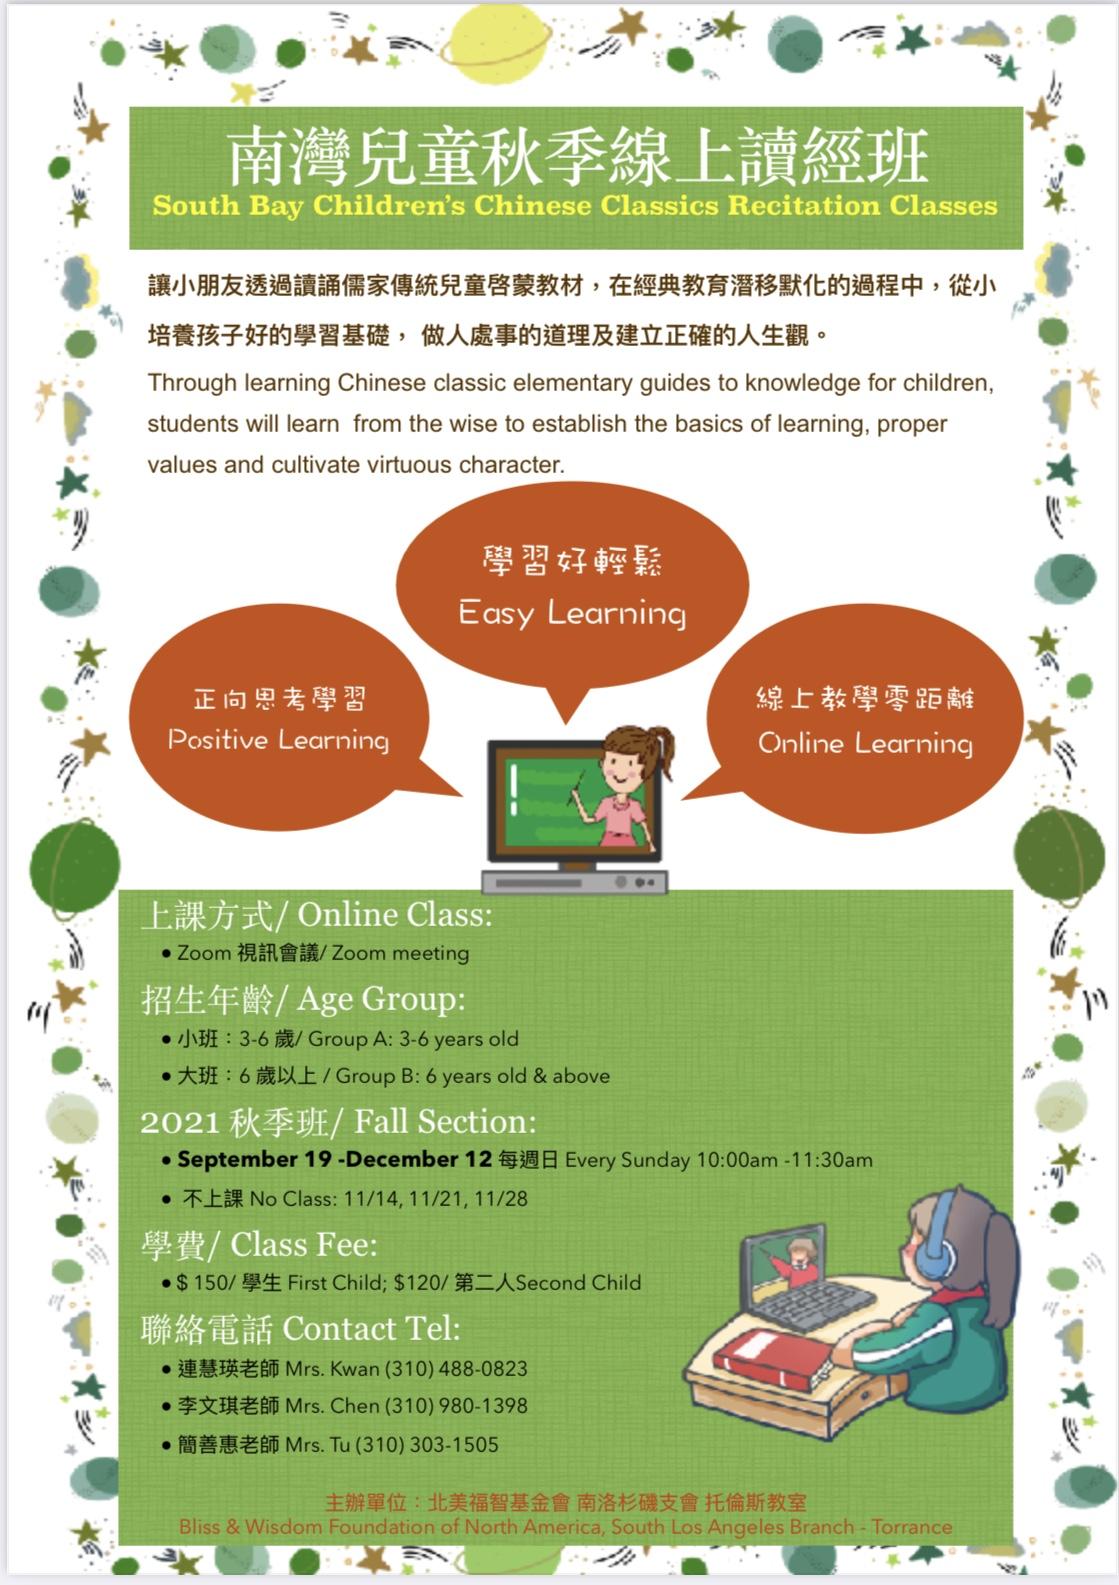 南灣兒童線上讀經班 Torrance Chinese Classics Recitation Classes